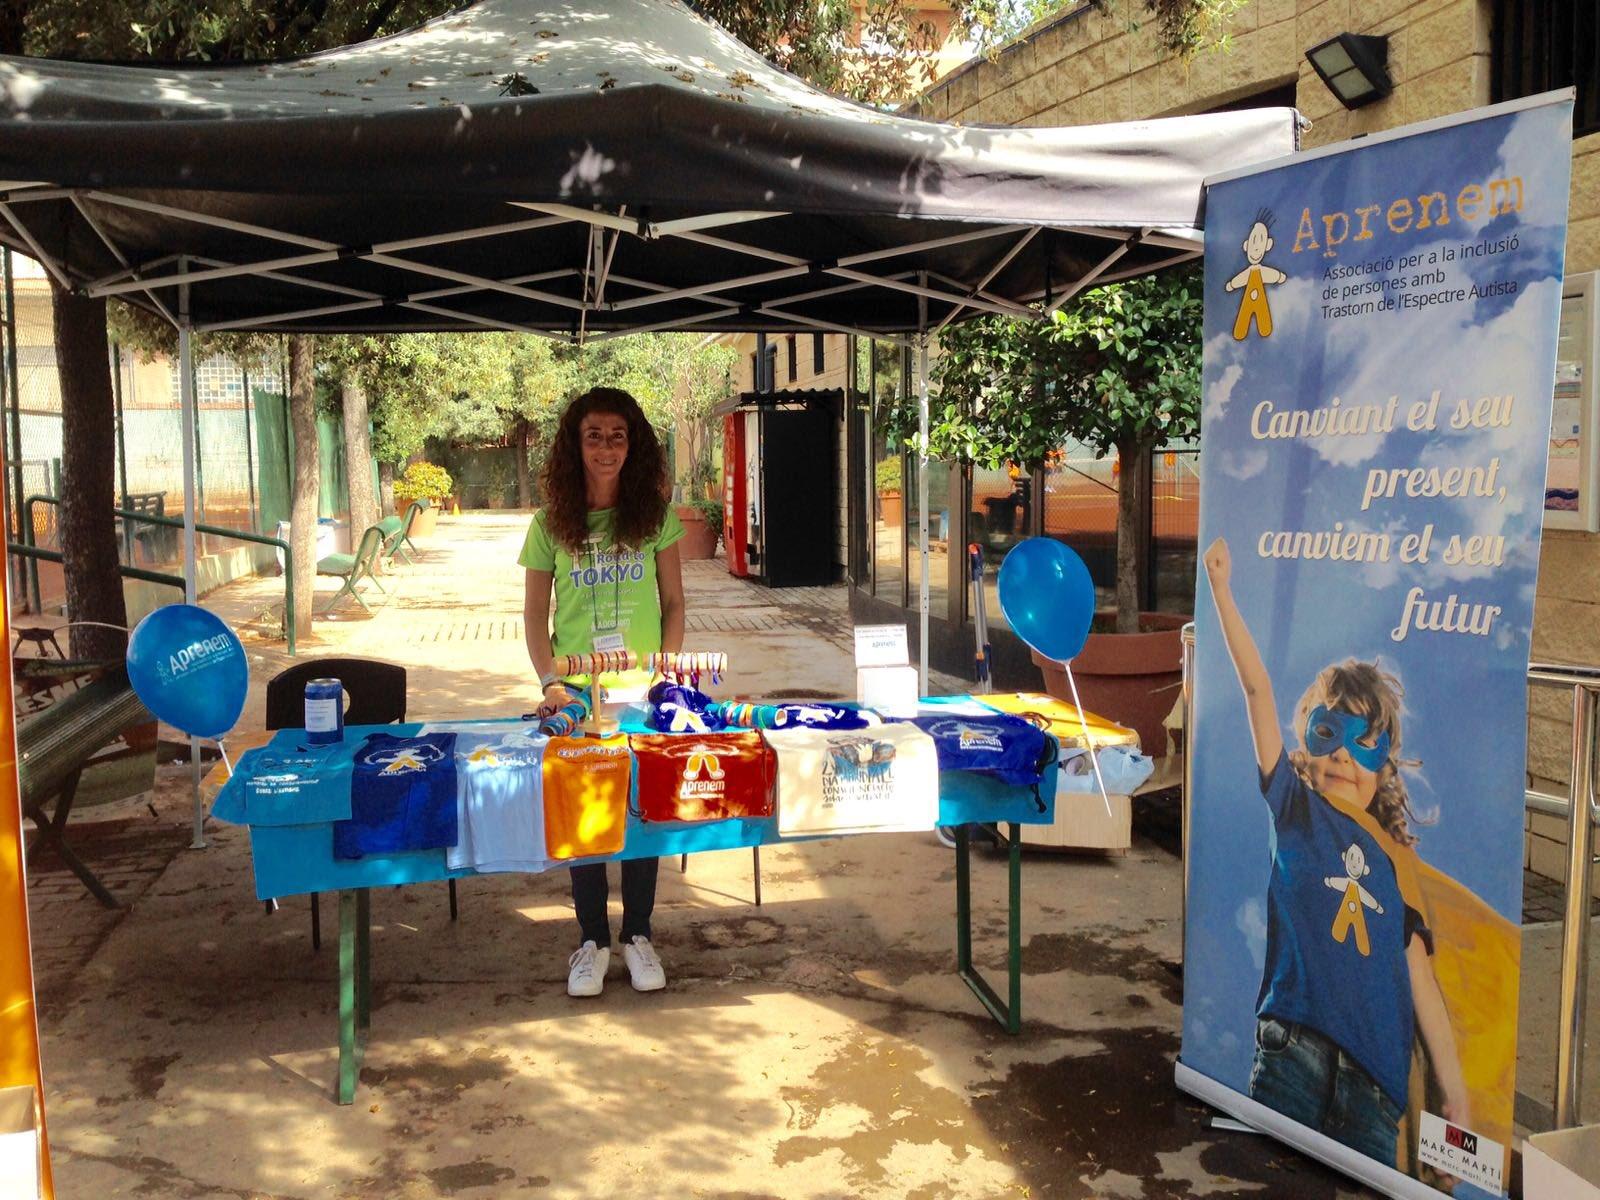 Ja en marxa al #DiadelaRaqueta al #cemolimpia, on els nens i nenes d'Aprenem fan paddle!!! https://t.co/jRJV6SbVm9